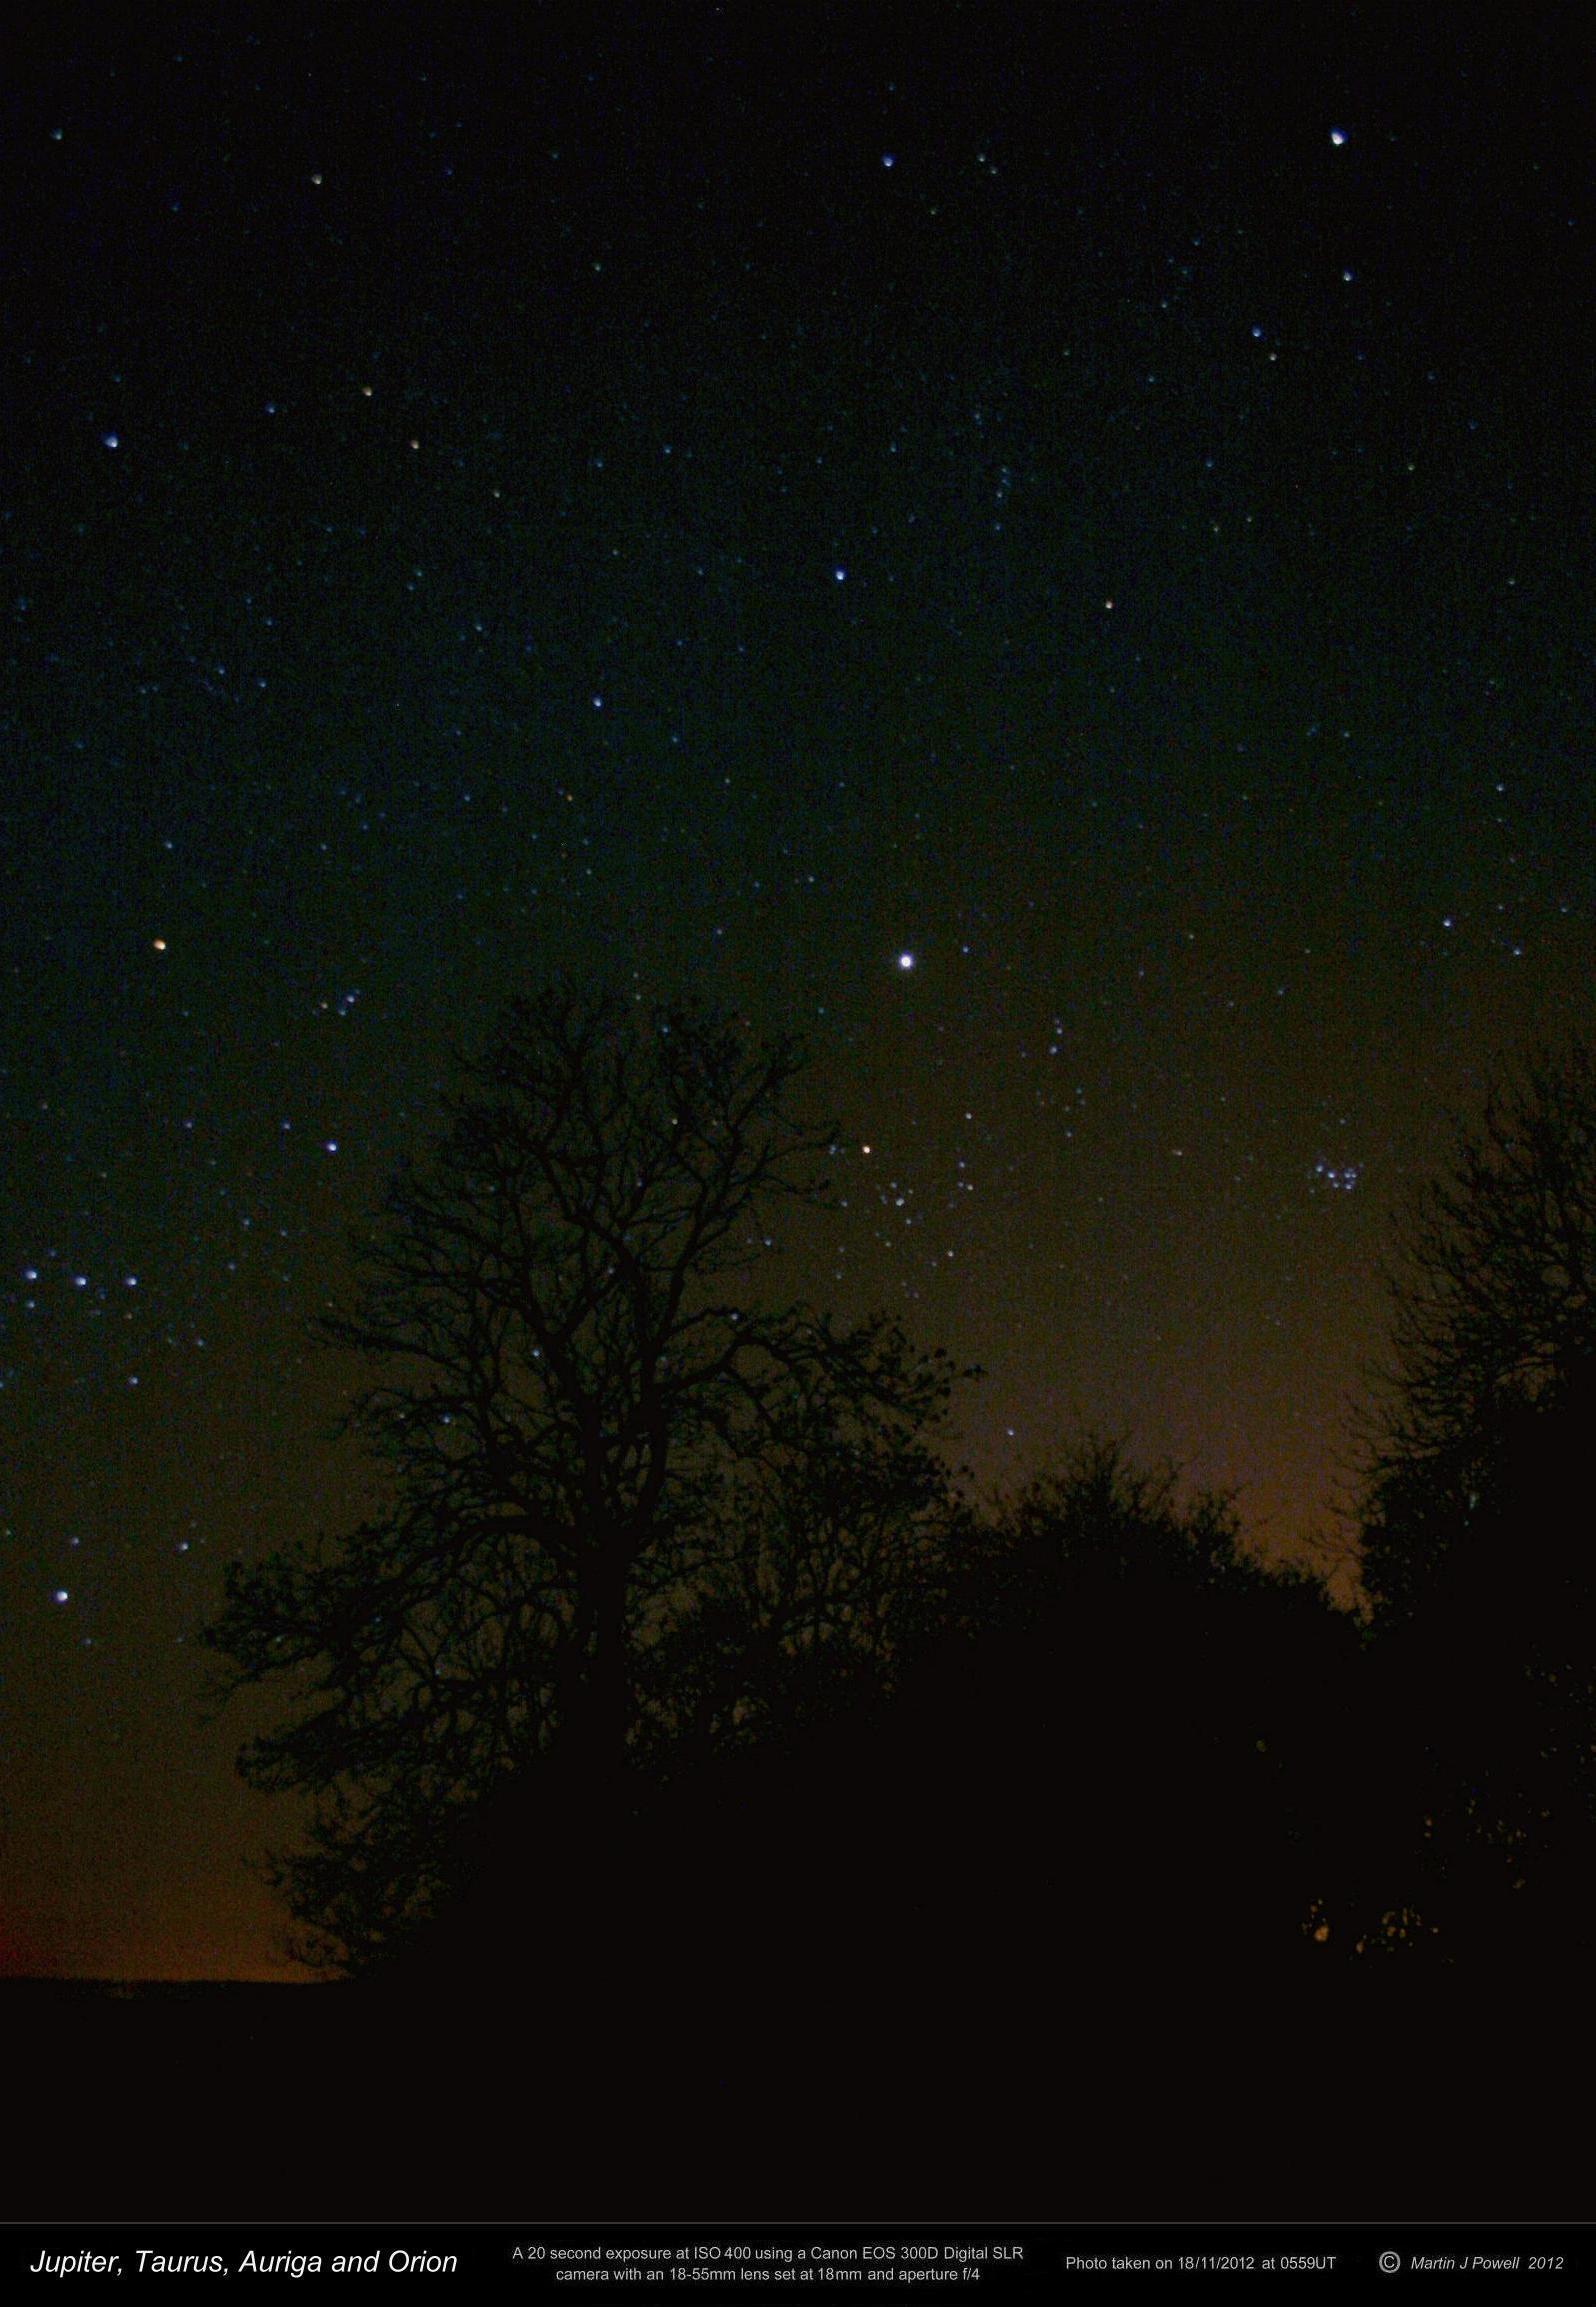 Jupiter in central taurus in november 2012 copyright martin j powell 2012